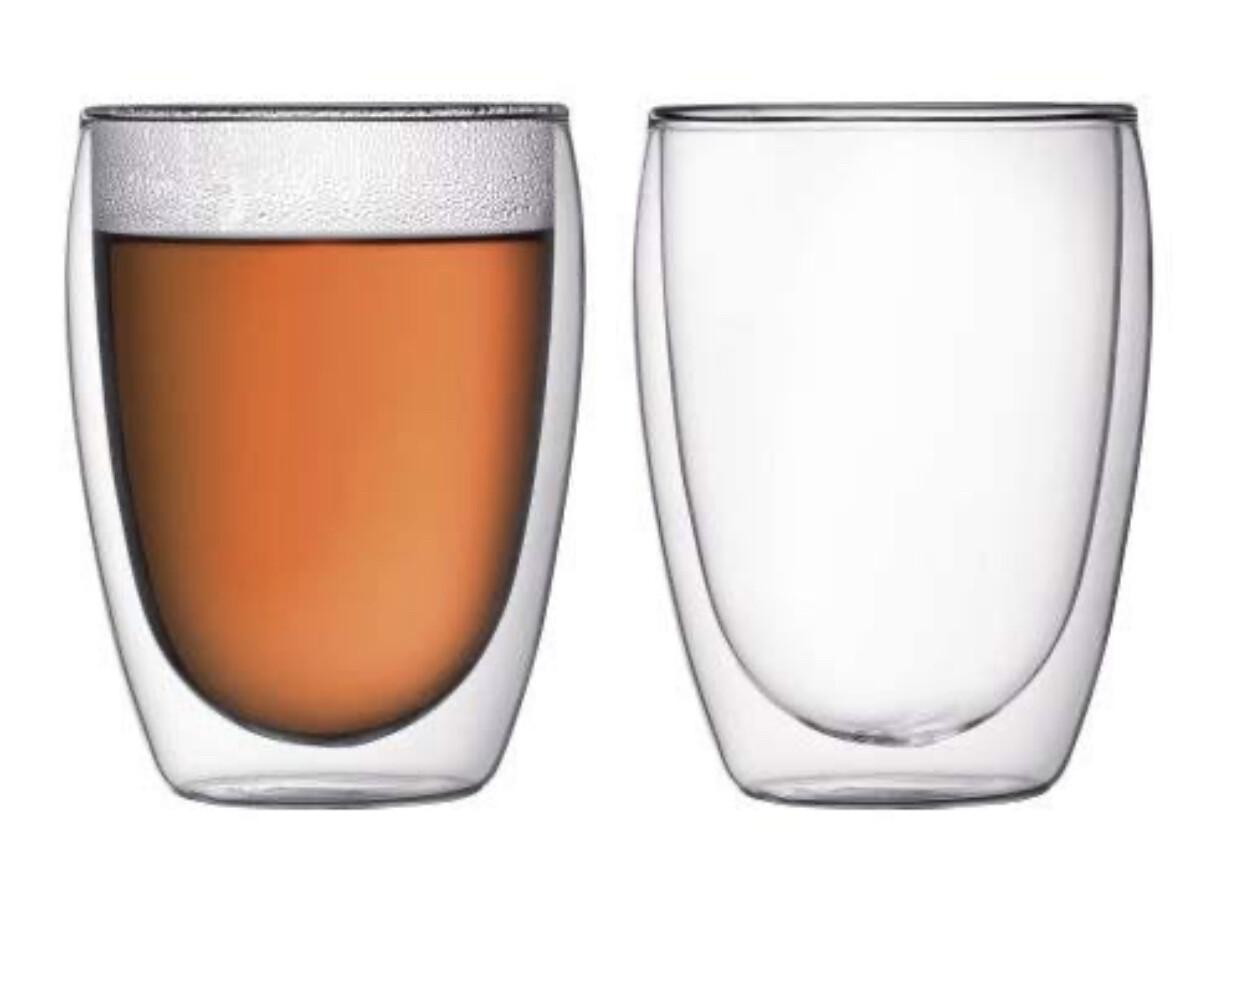 BODUM - Pavina Double Wall Thermo - Glasses (2 pcs) - 0.351L / 12oz